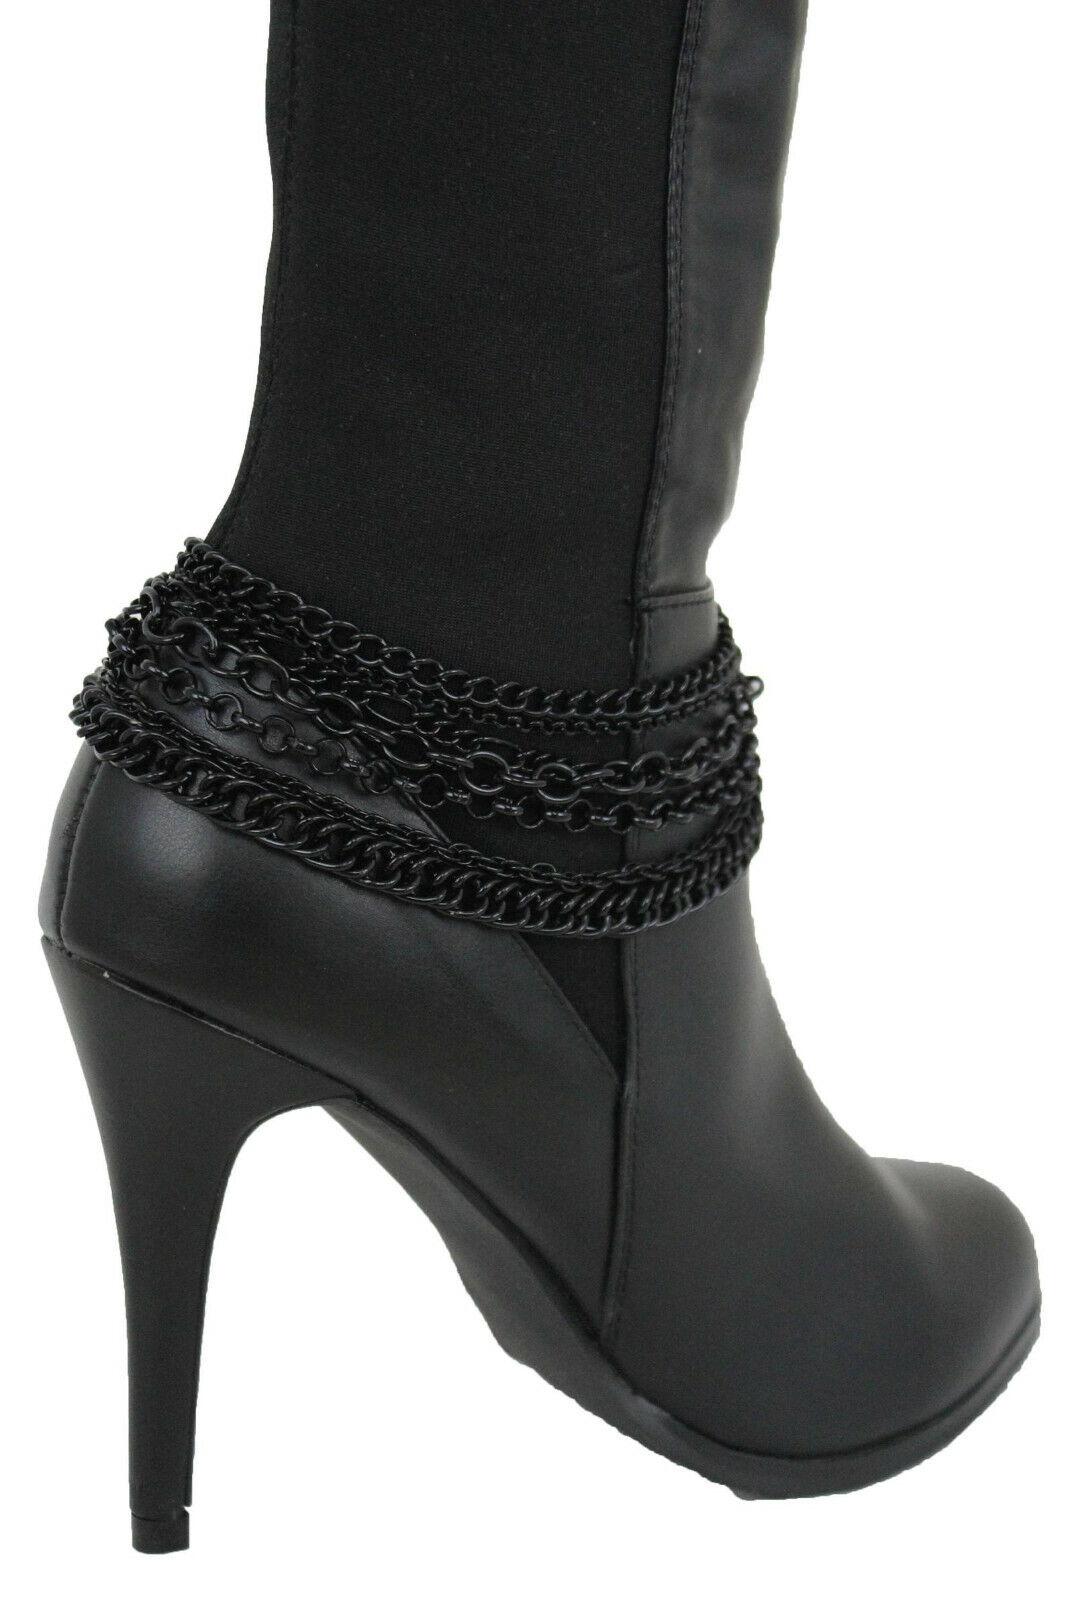 Women Boot Bracelet Dark Cool Black Metal Chains Casual Anklet Bling Shoe Charm